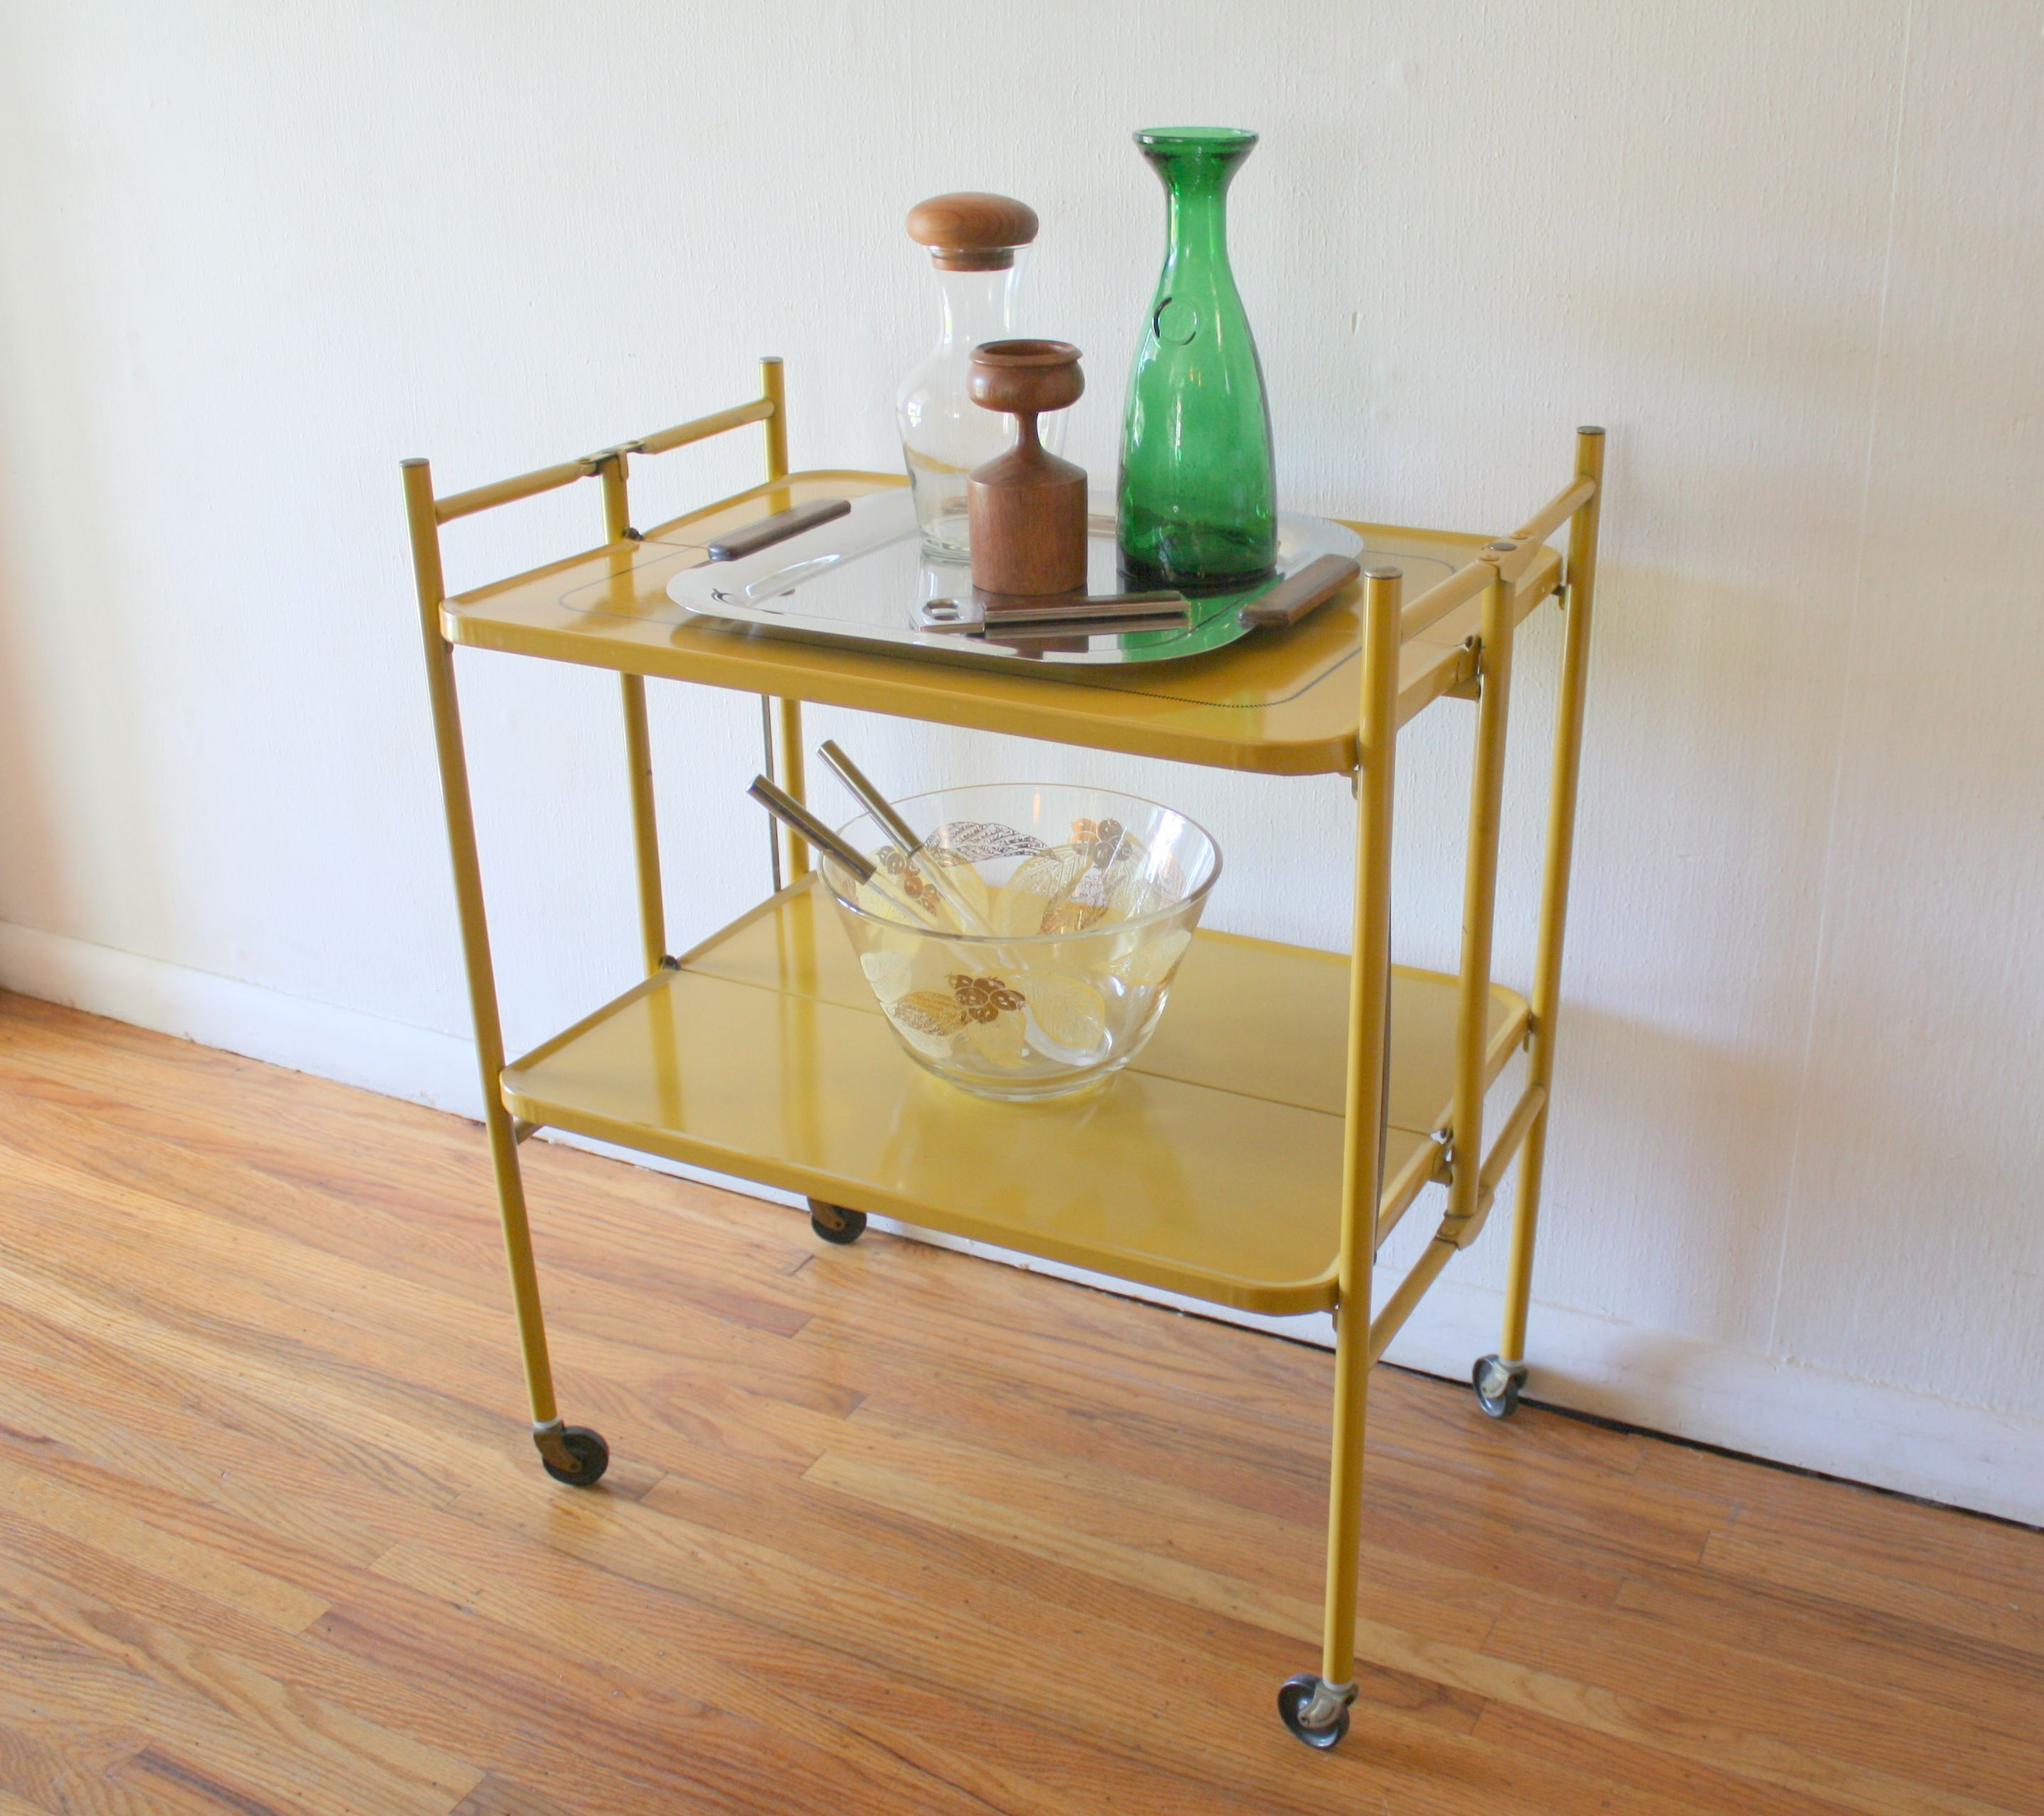 Mid Century Modern Folding Bar Serving Cart In A Cheerful Sunflower Yellow